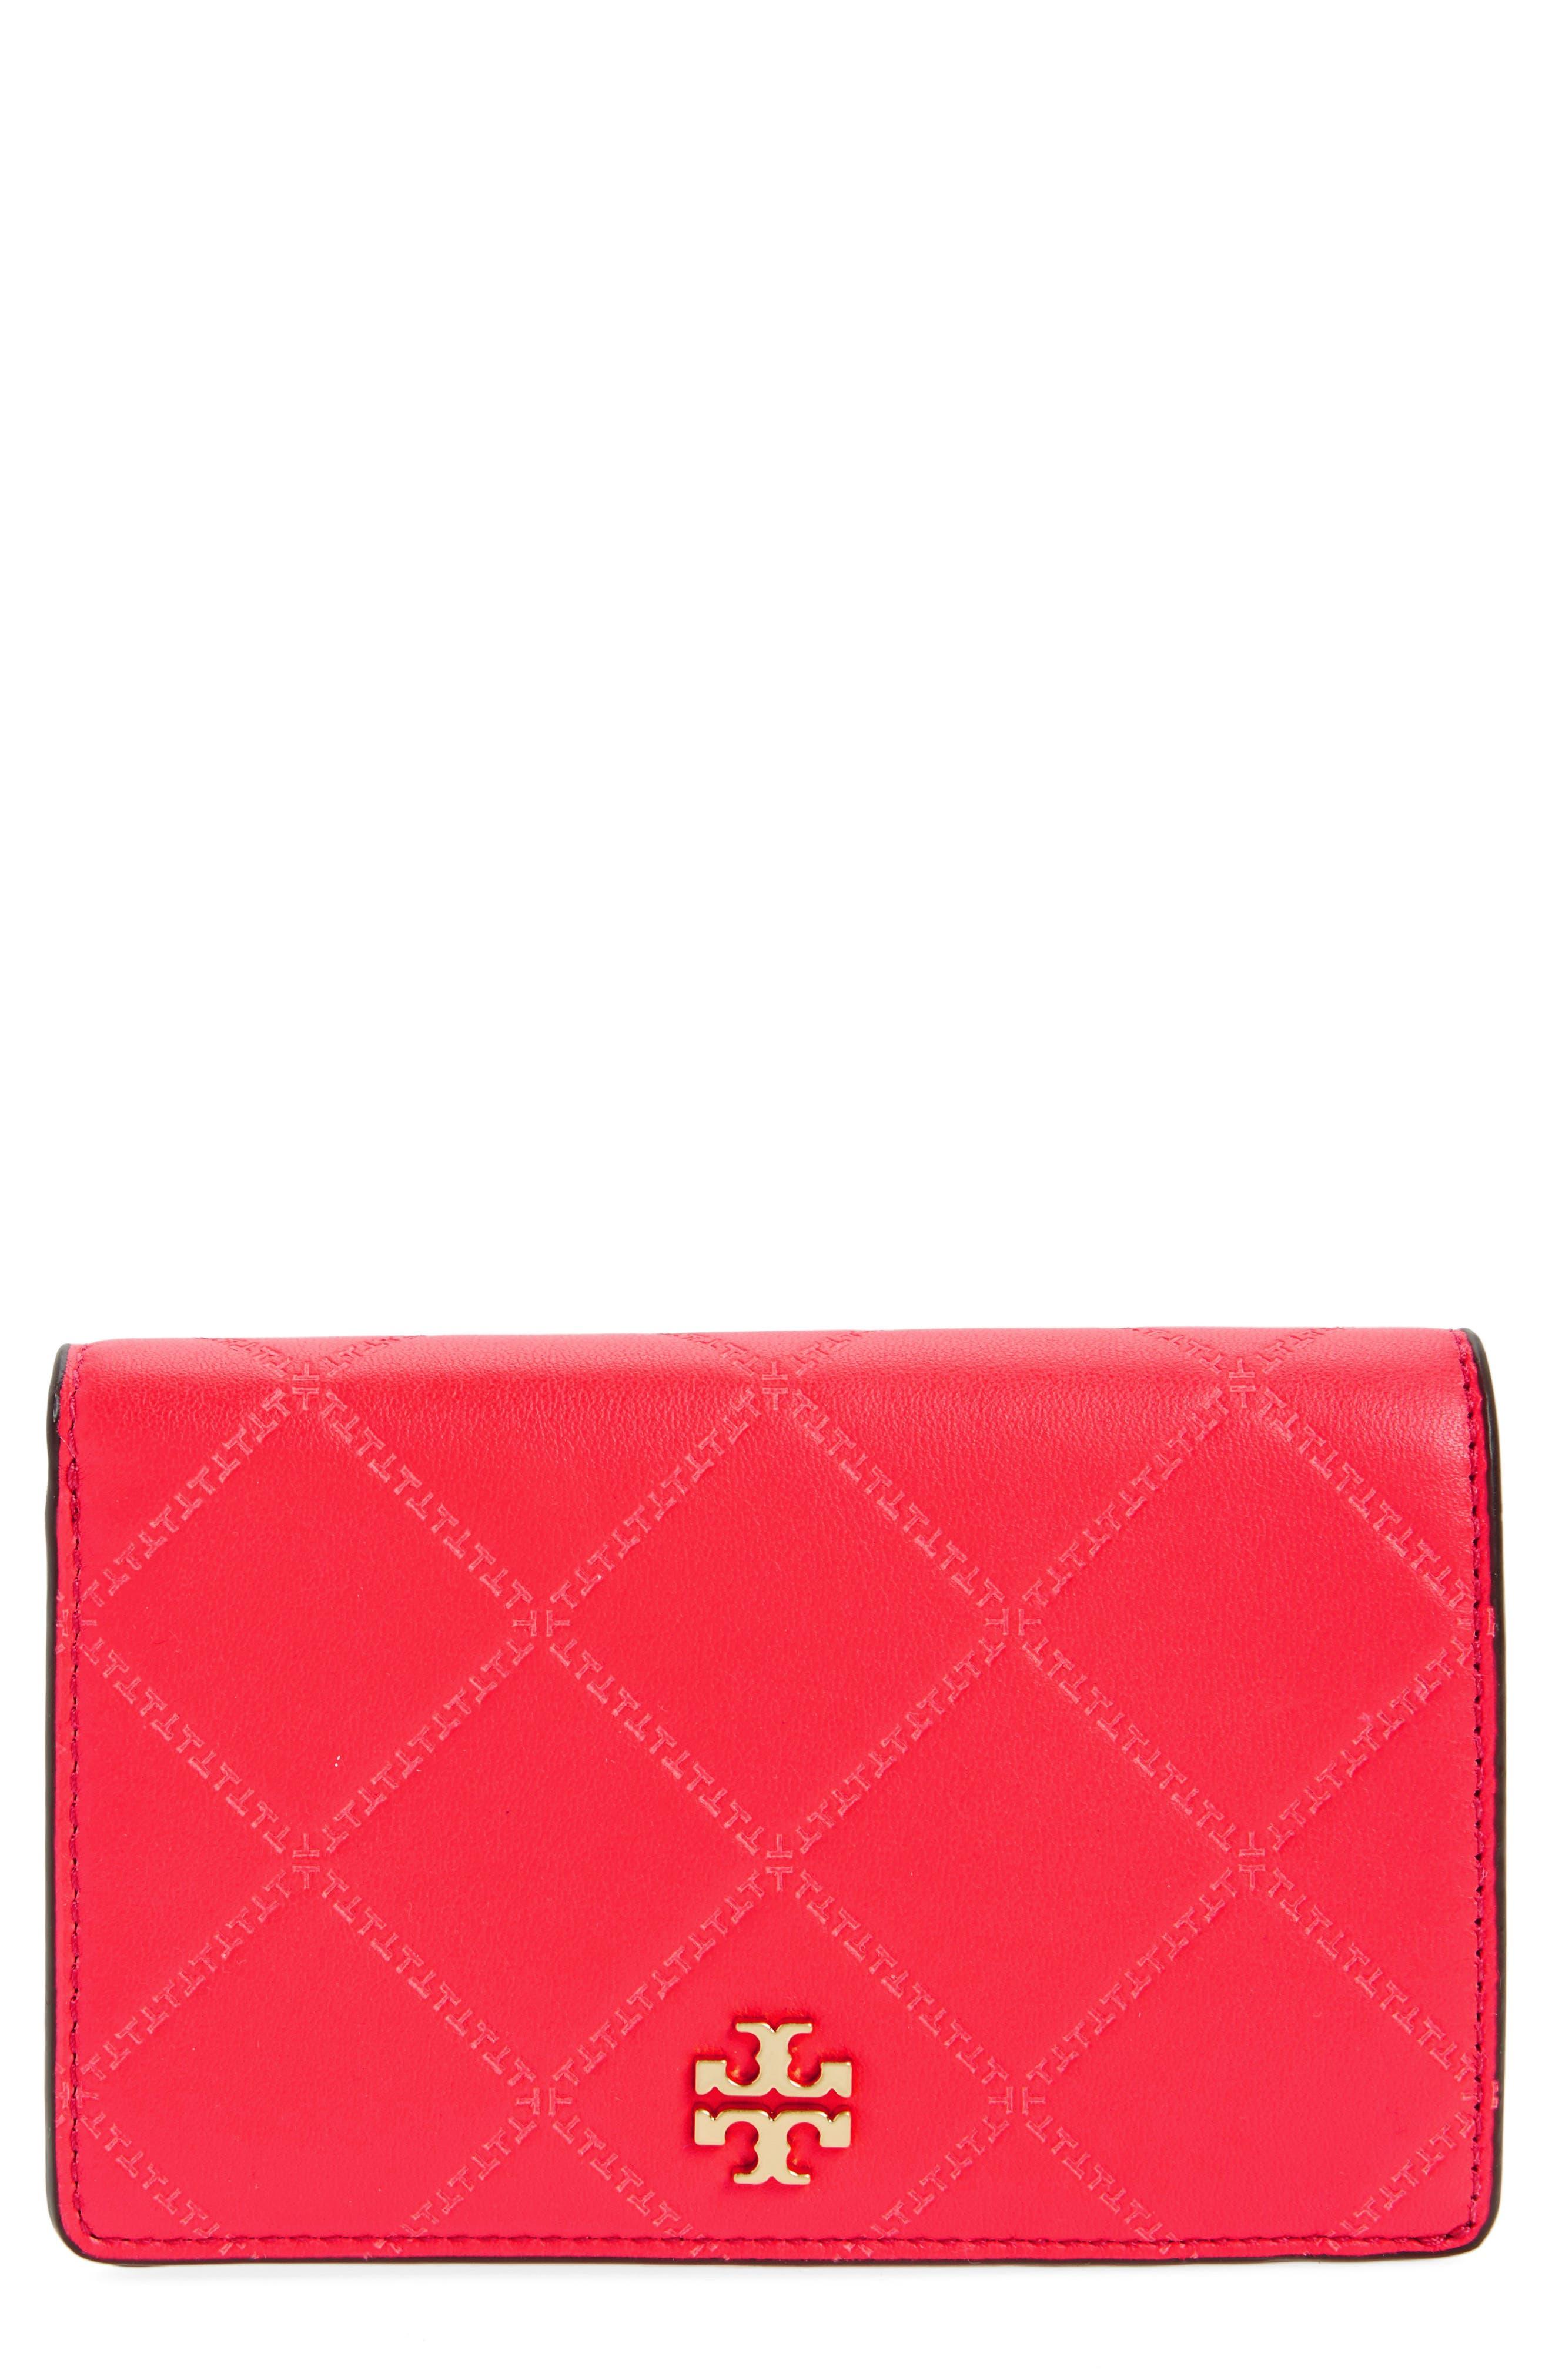 Tory Burch Medium Georgia Slim Leather Wallet